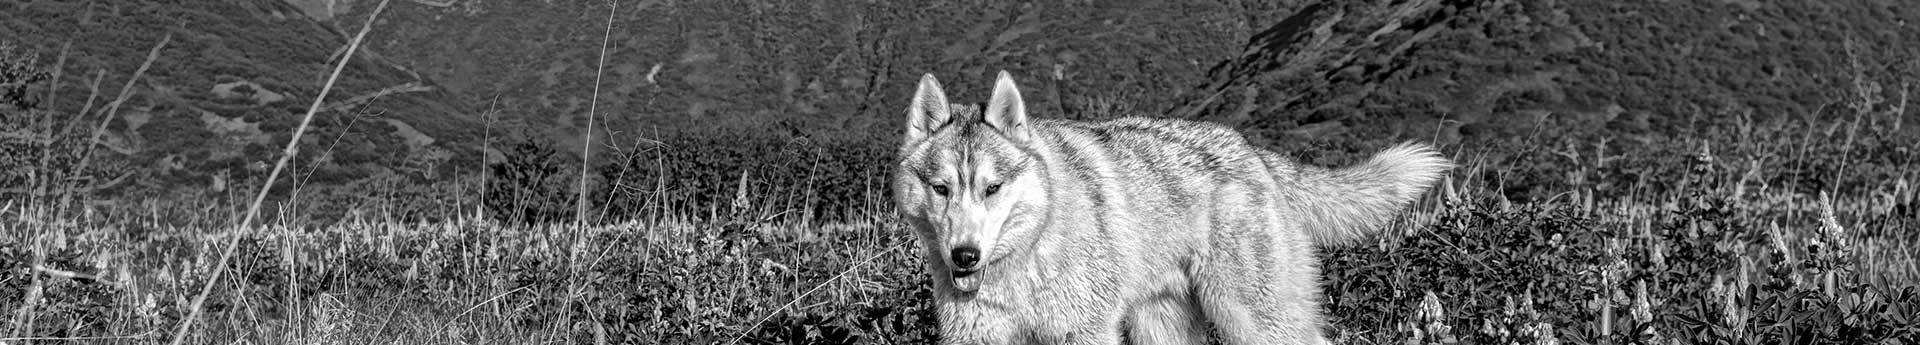 Confident Kalsin from Kodiak Island, Alaska